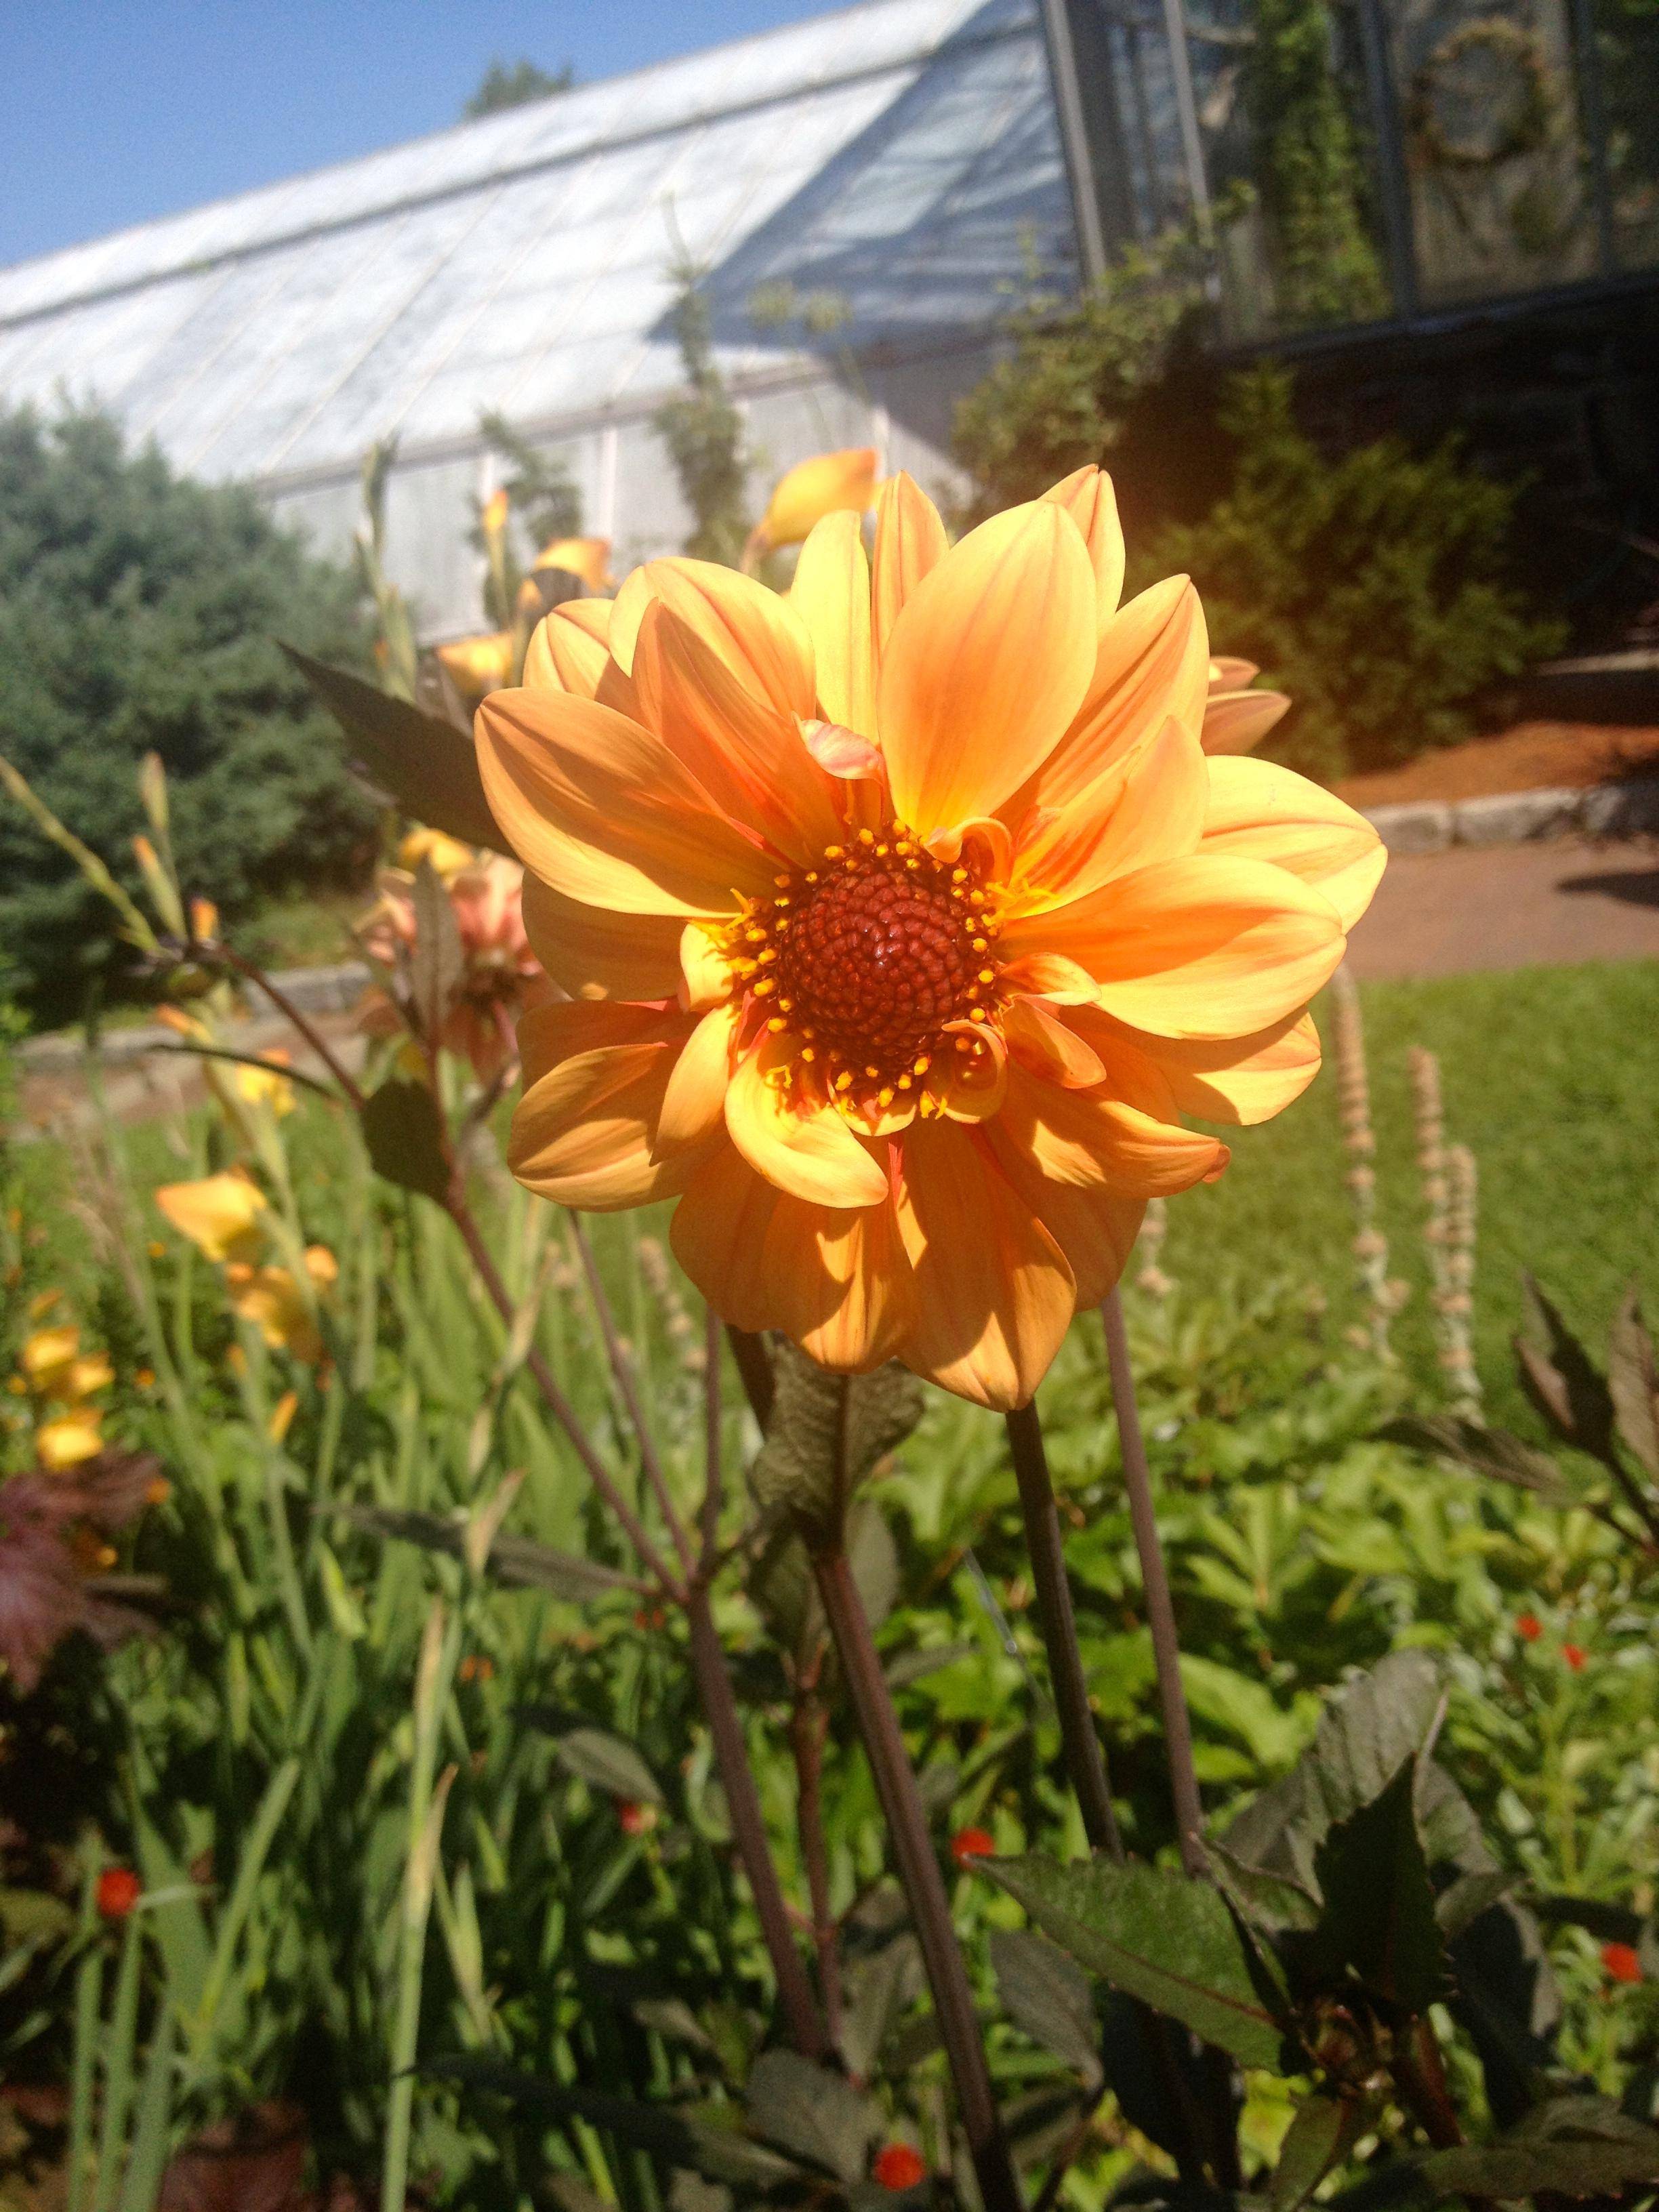 Dahlia's at the Garden by Ms. Cruz